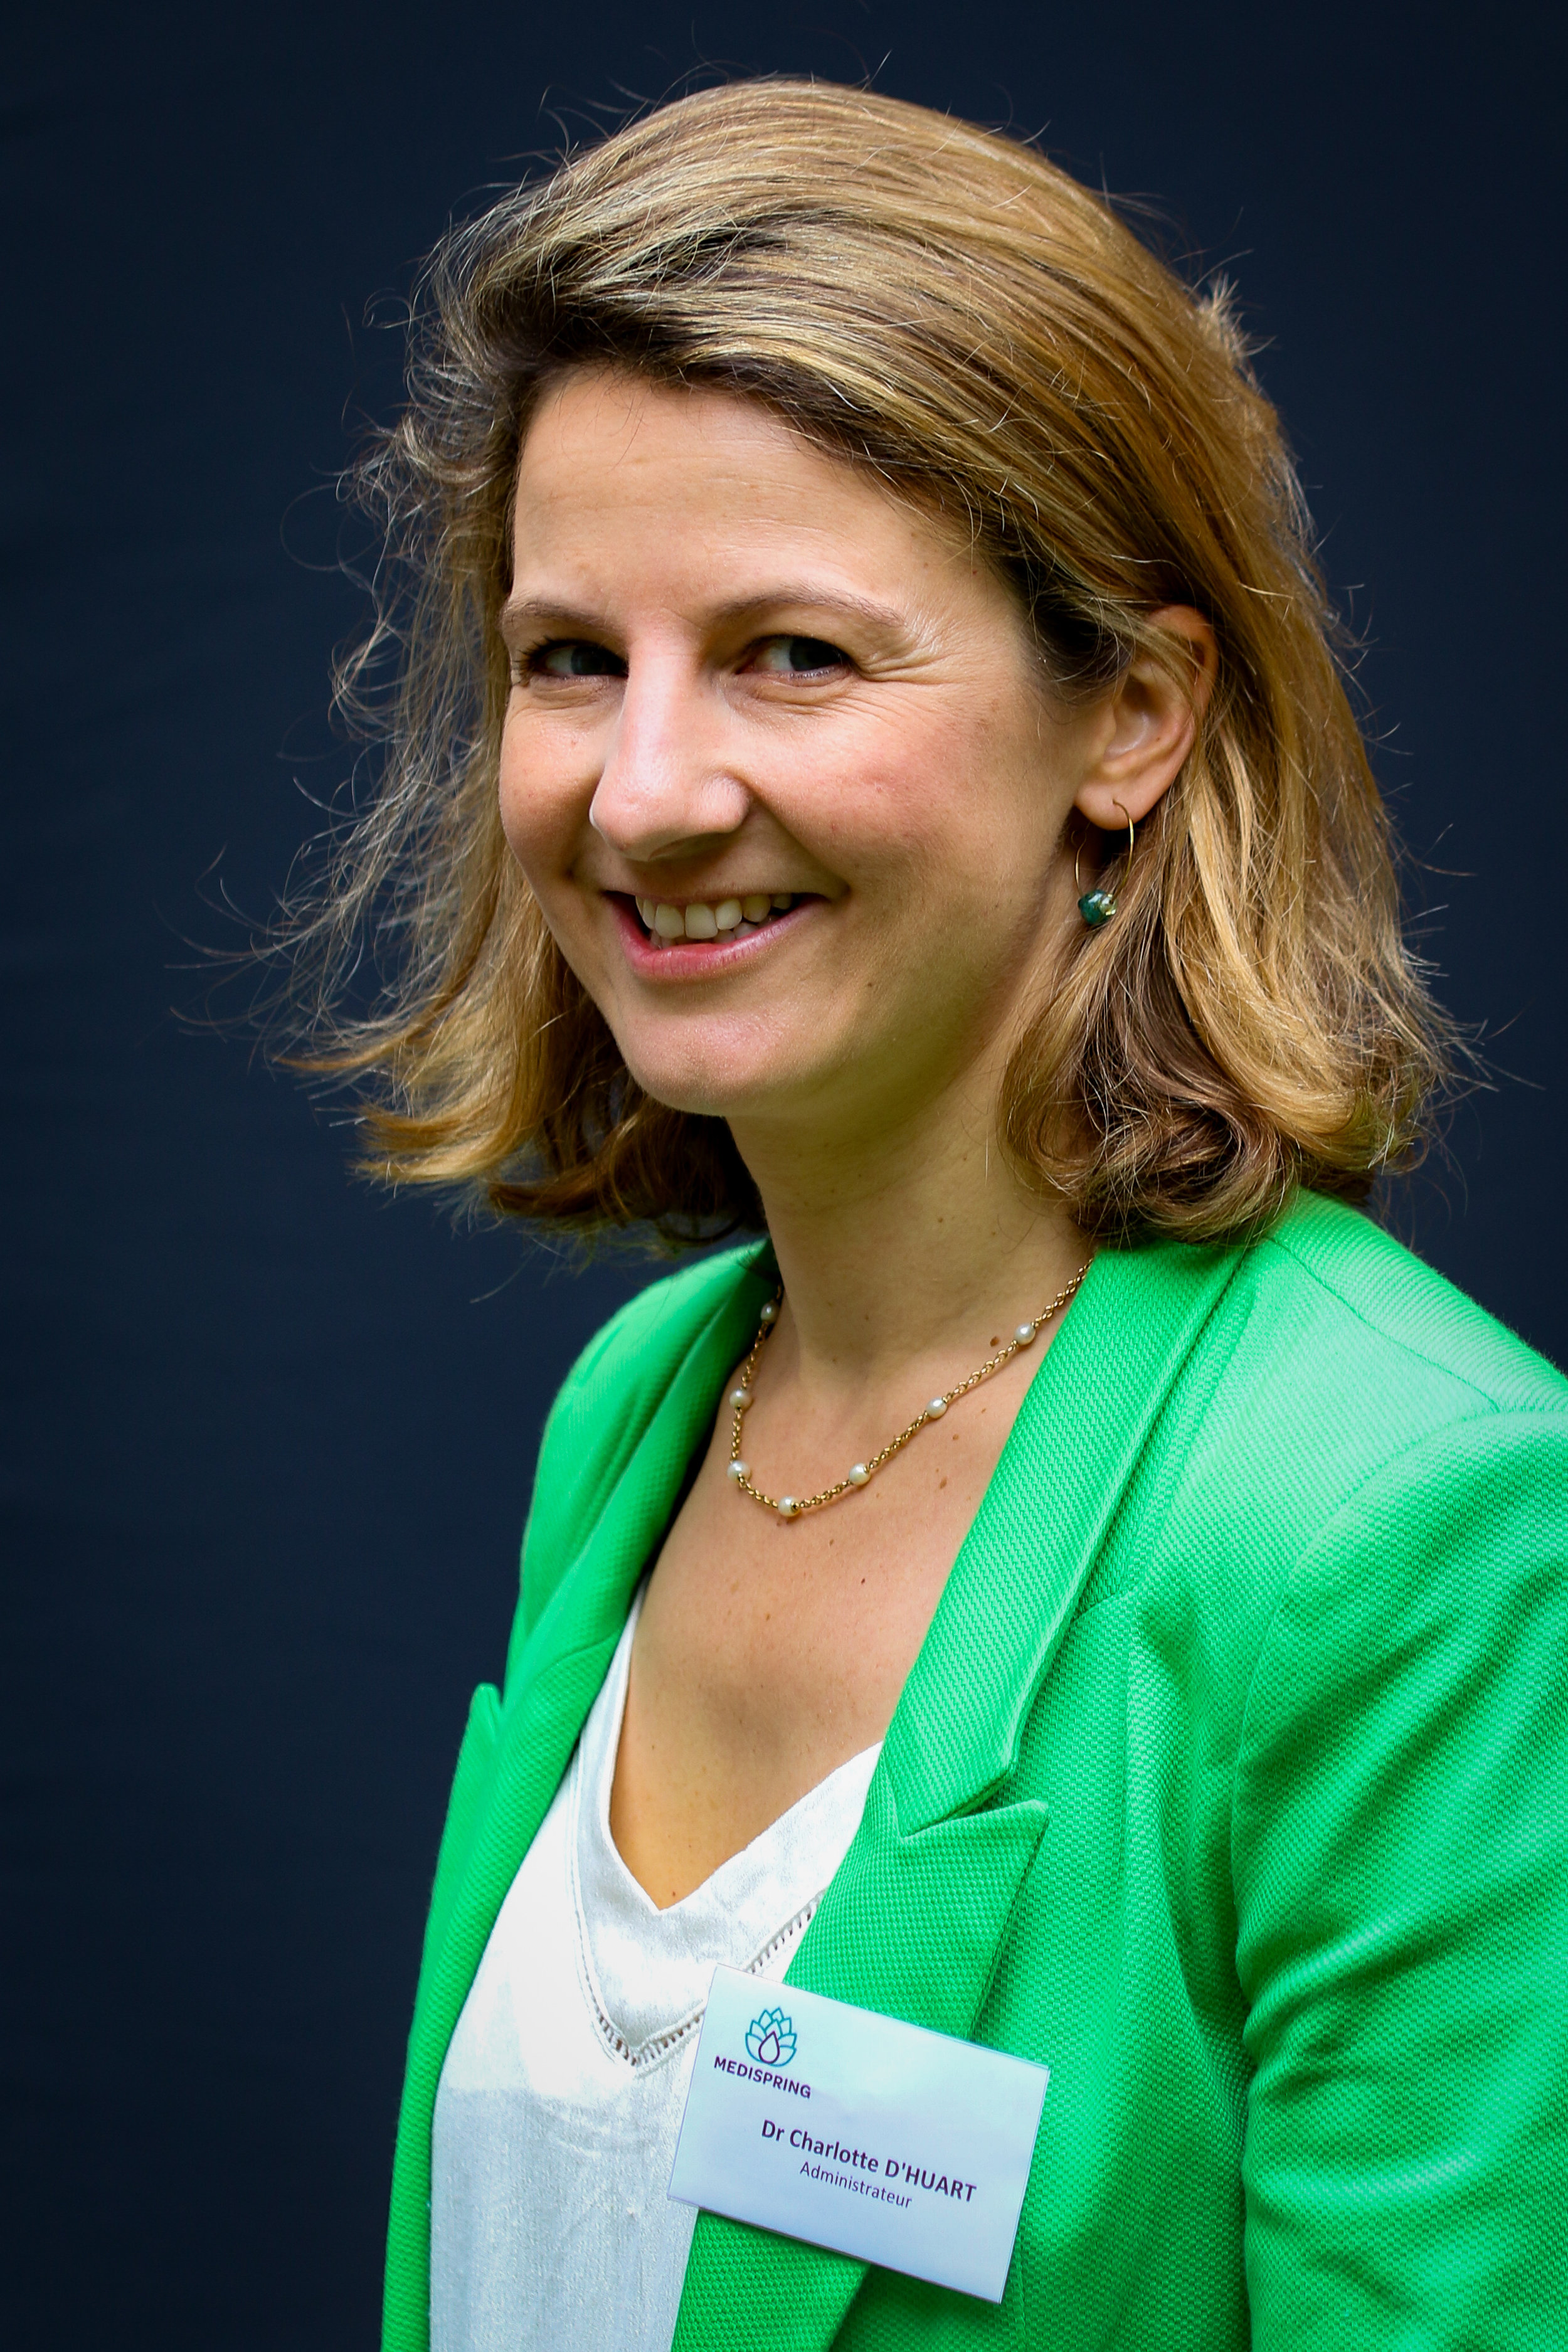 Dr. Charlotte d'Huart